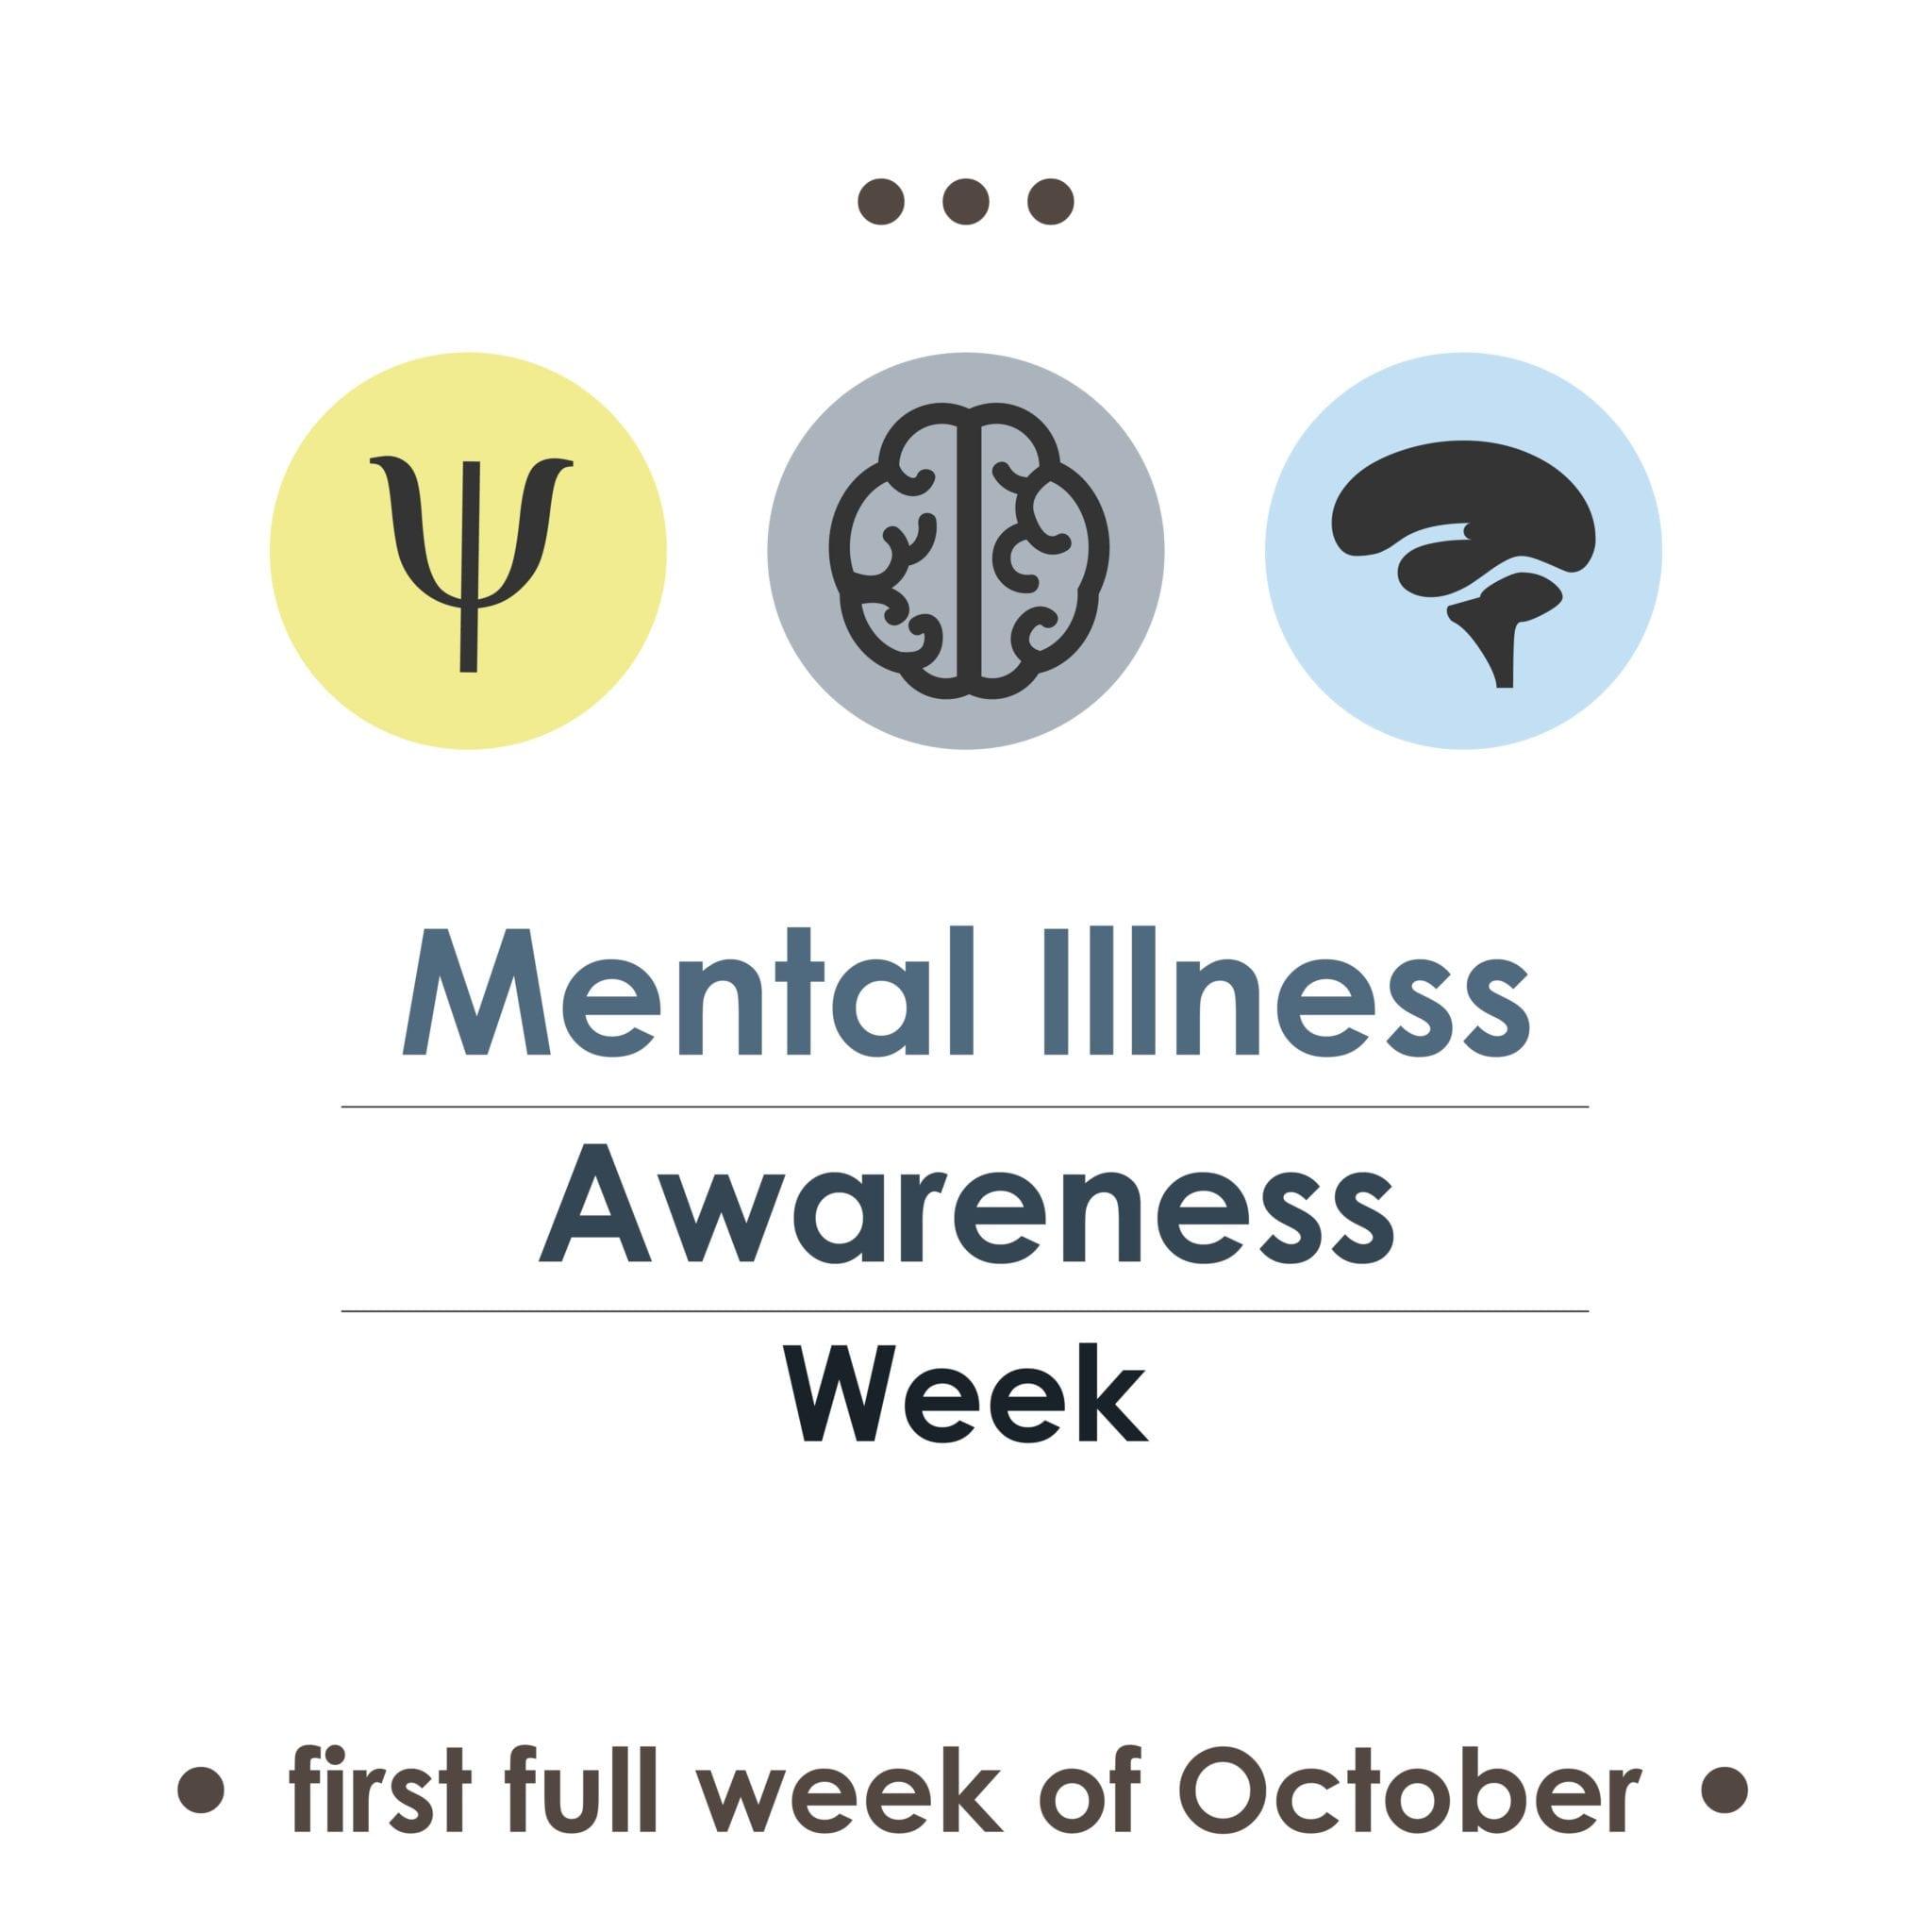 Banner for mental illness awareness week in October